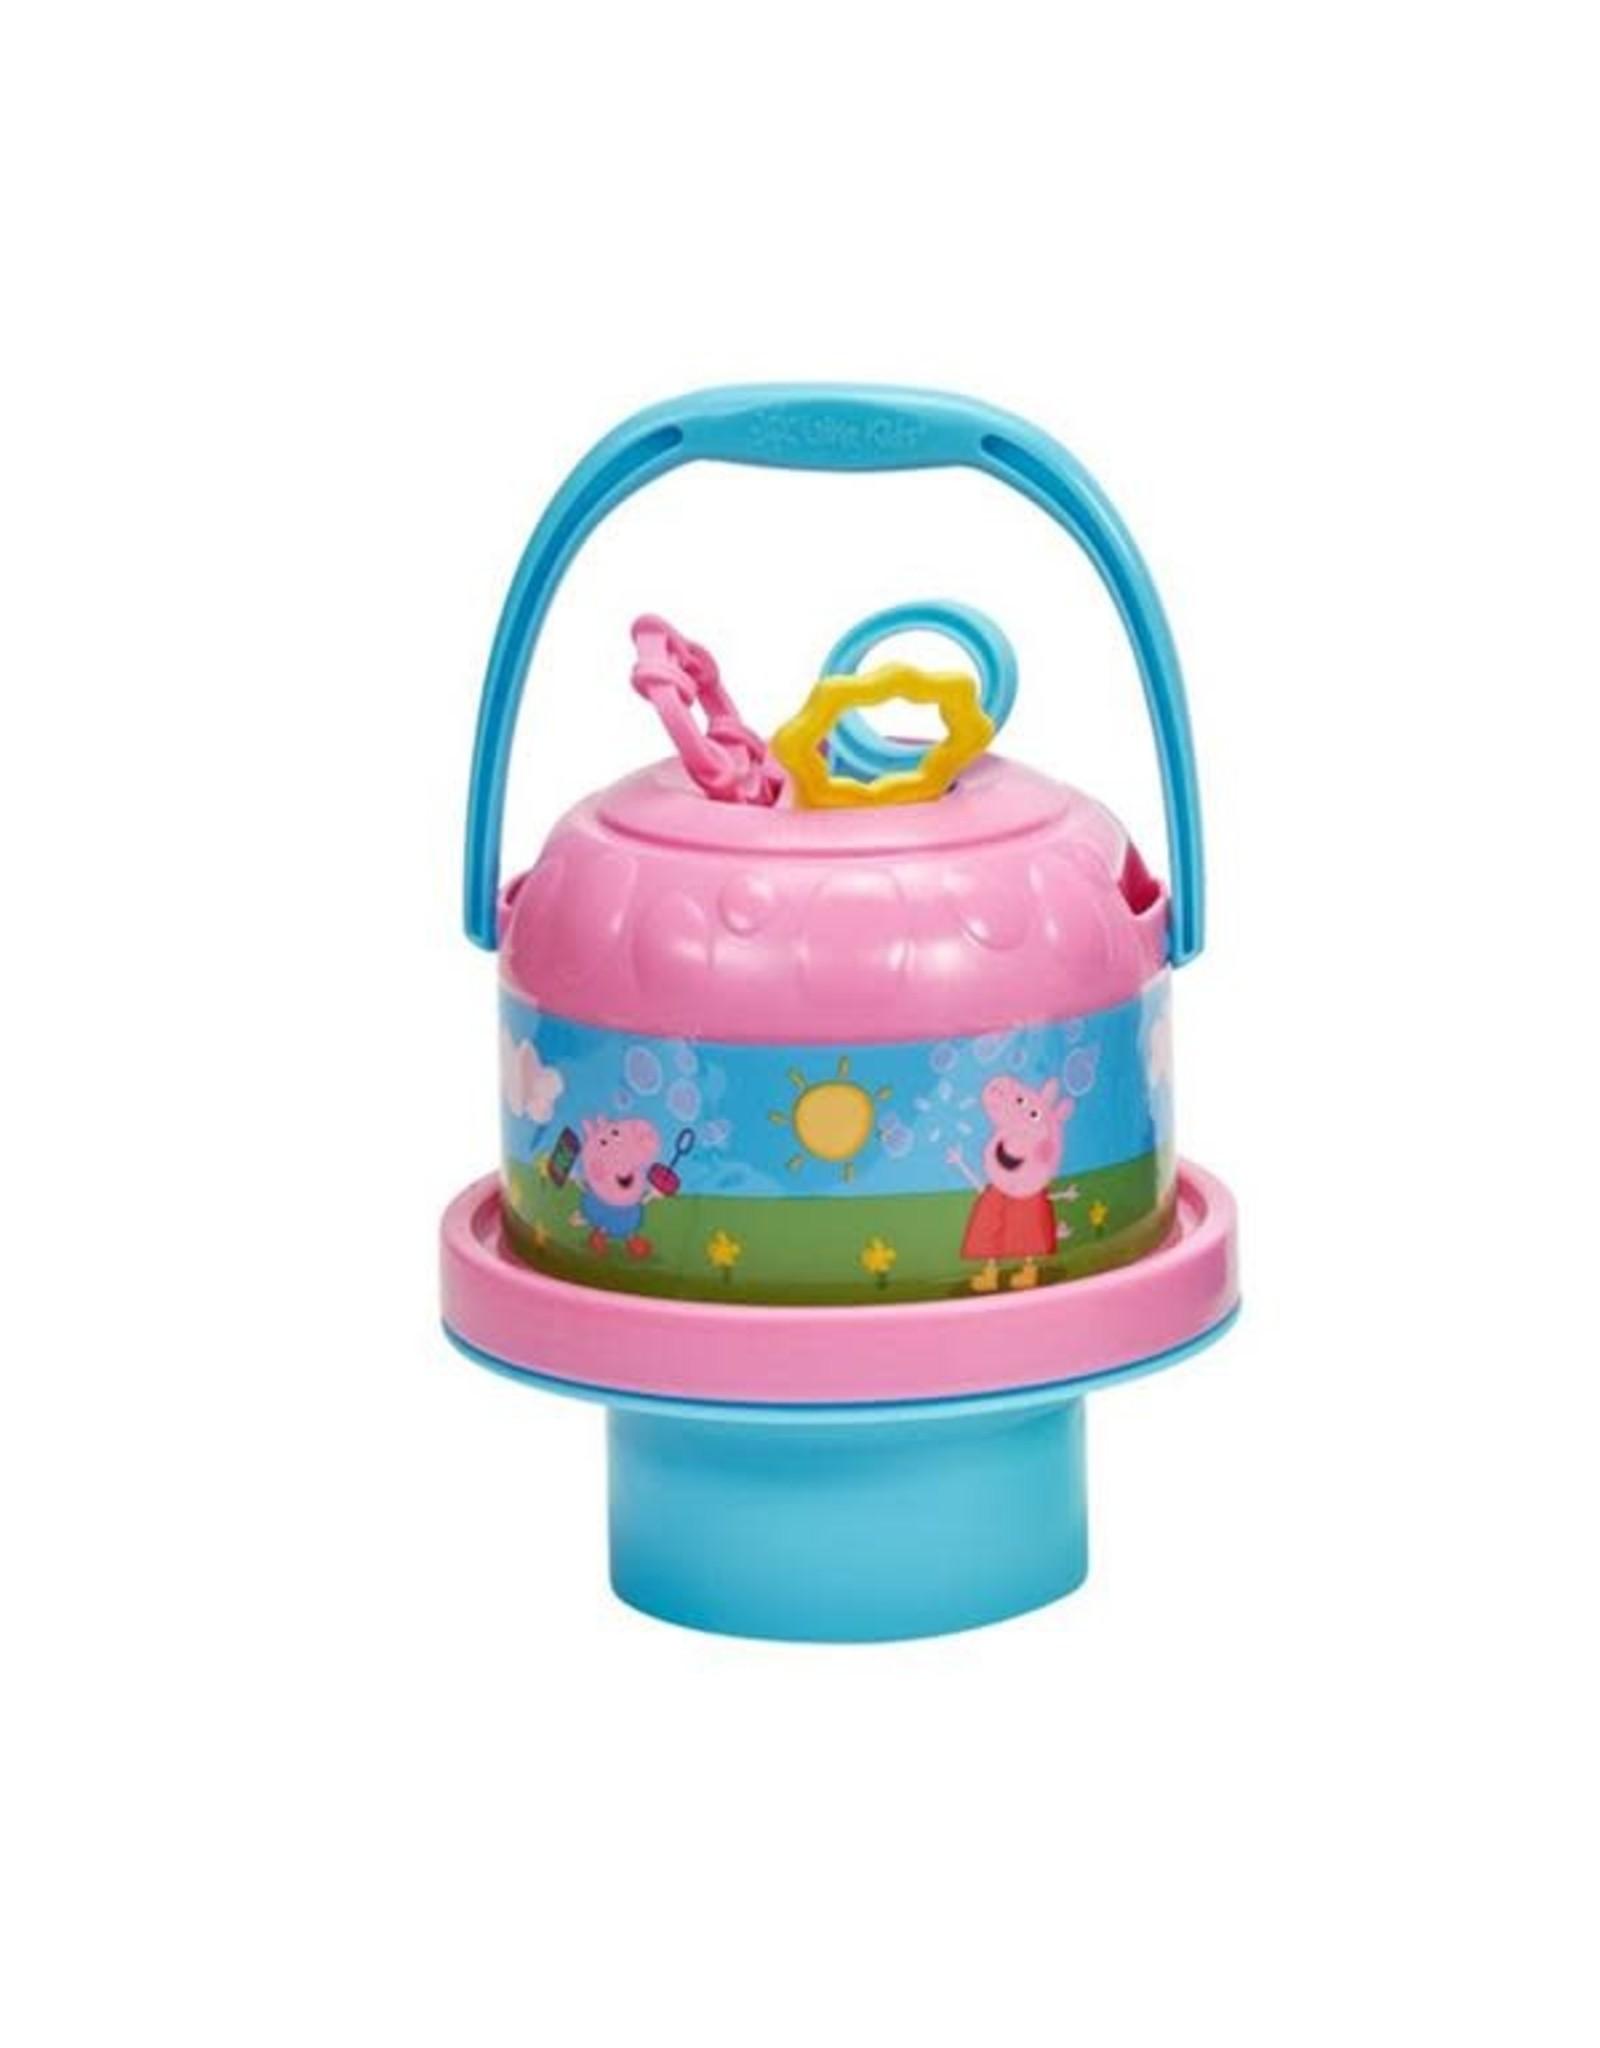 Fubbles Fubbles No-Spill Bubblin' Bucket Assorted Styles